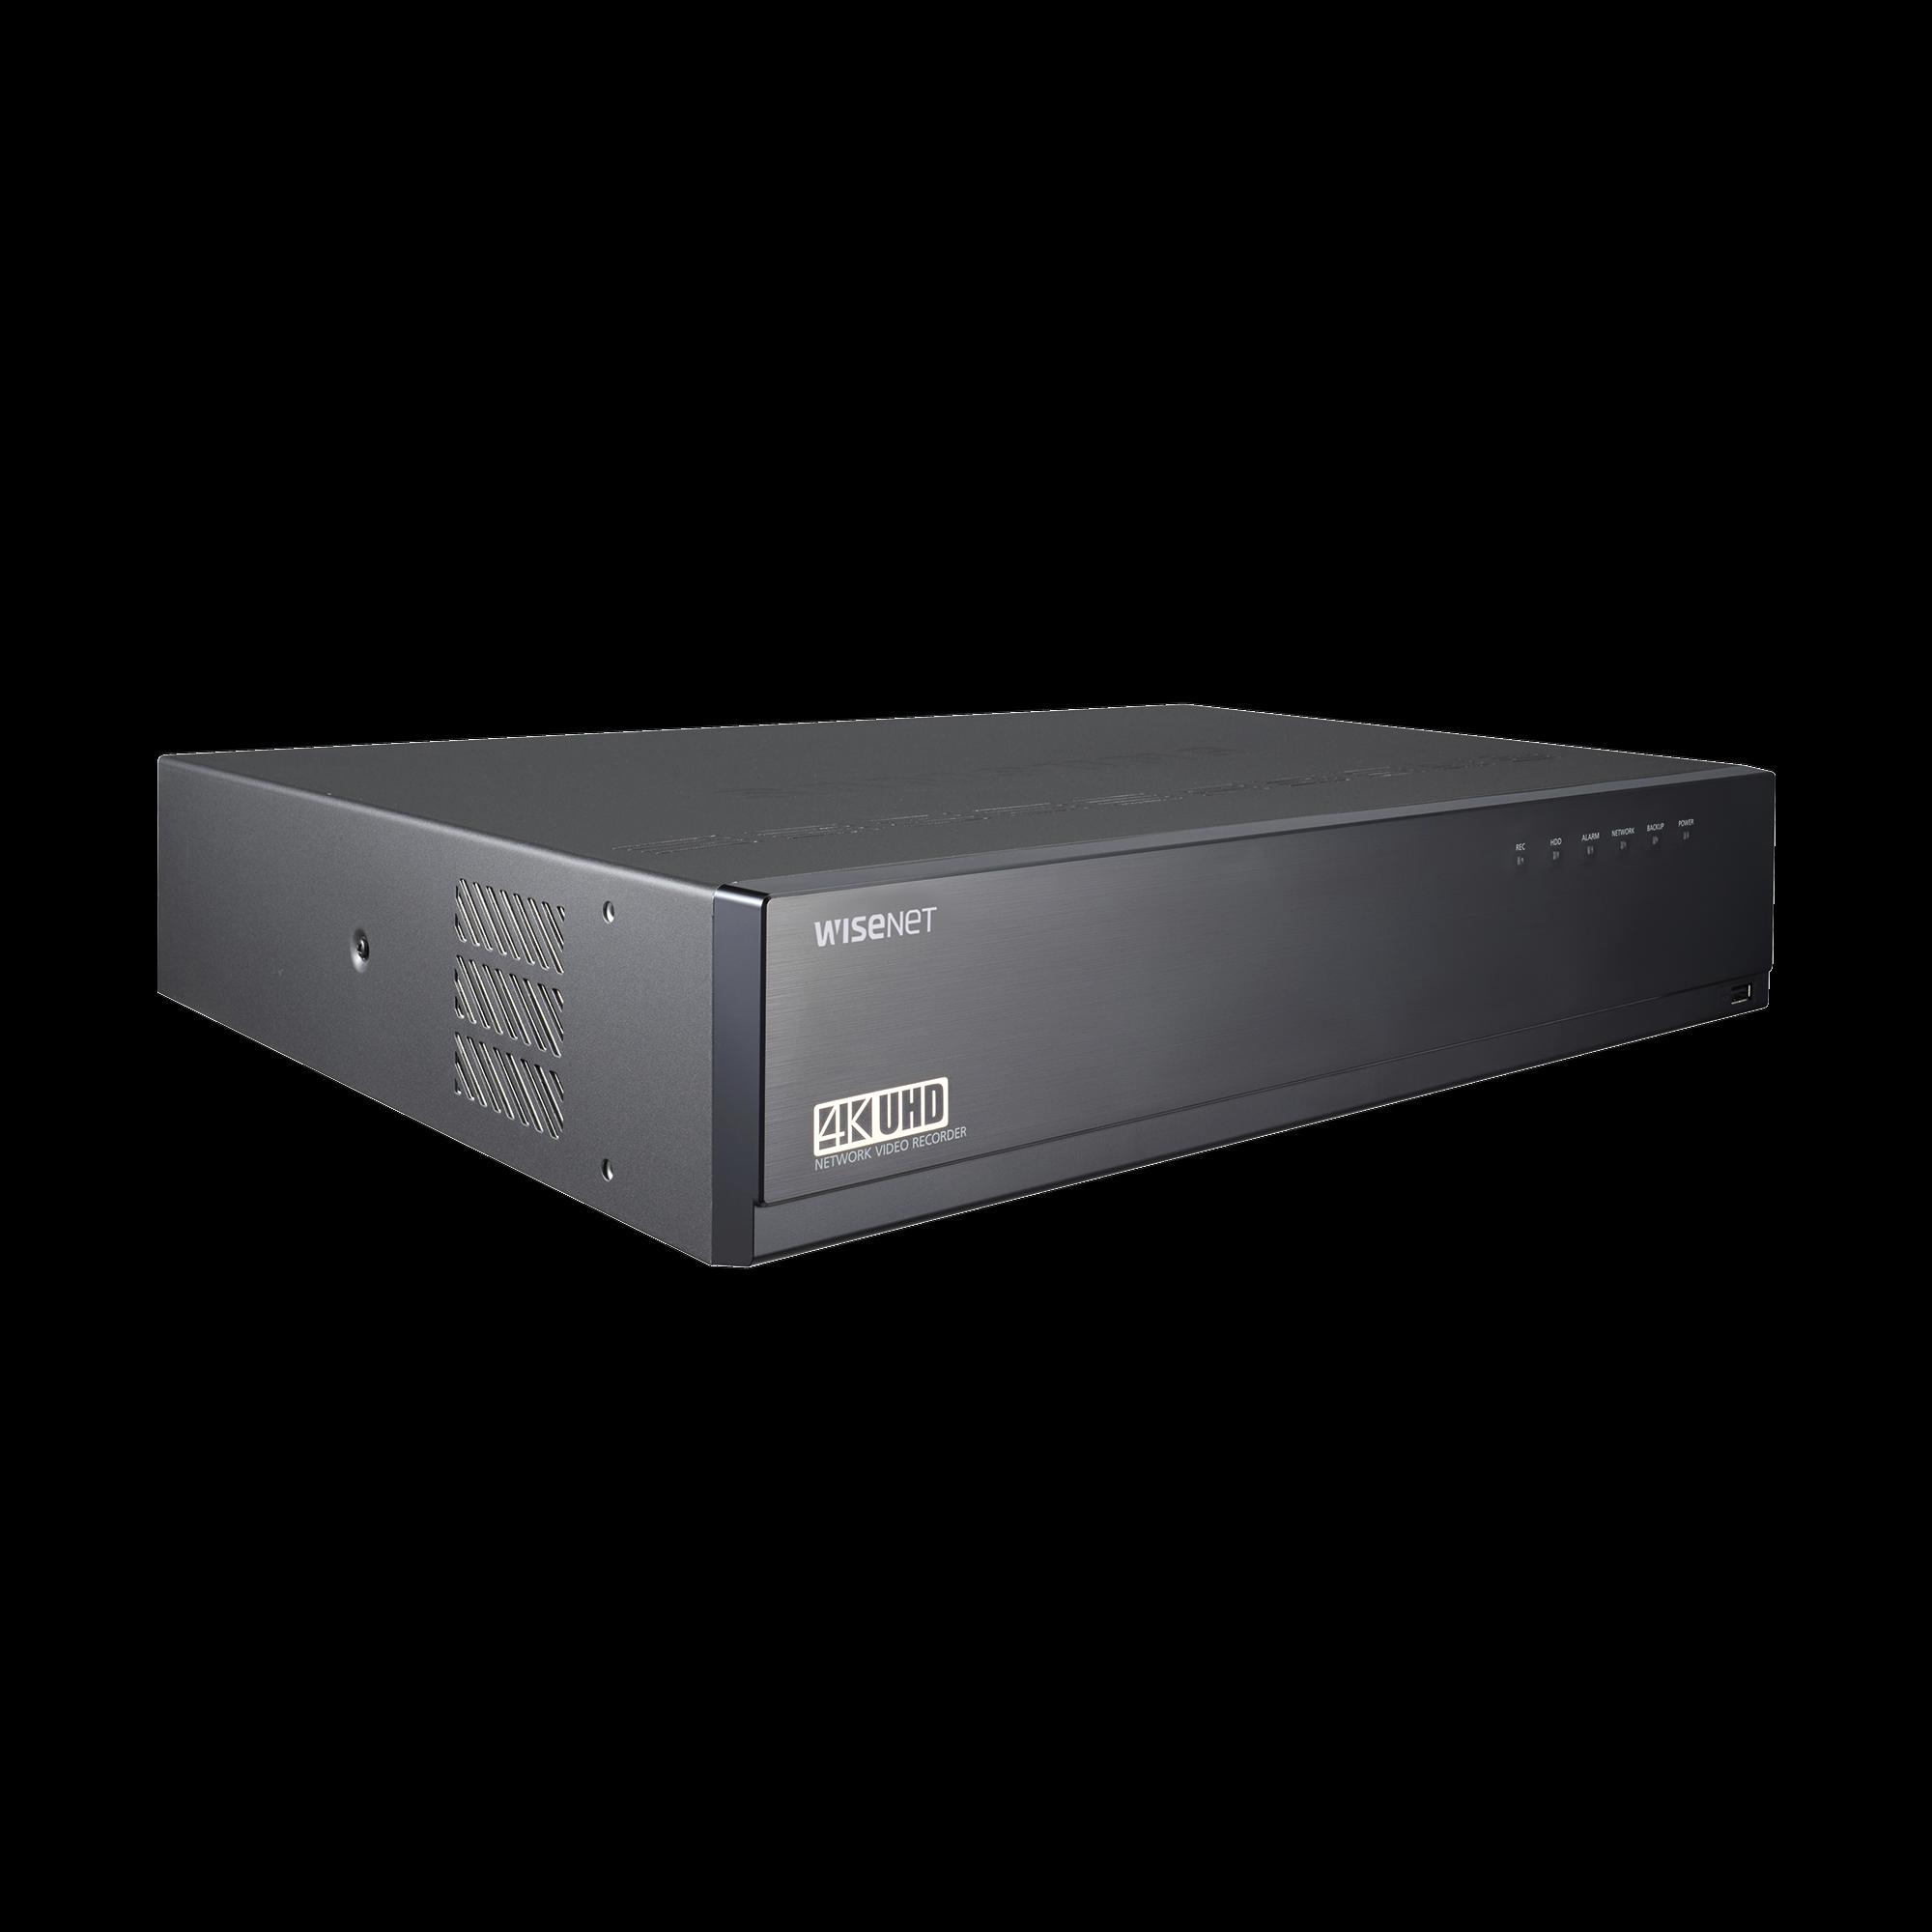 NVR de 32 canales / 12MP / Hasta 8 Discos Duros / H.265 & Wisestream / Wisenet P2P